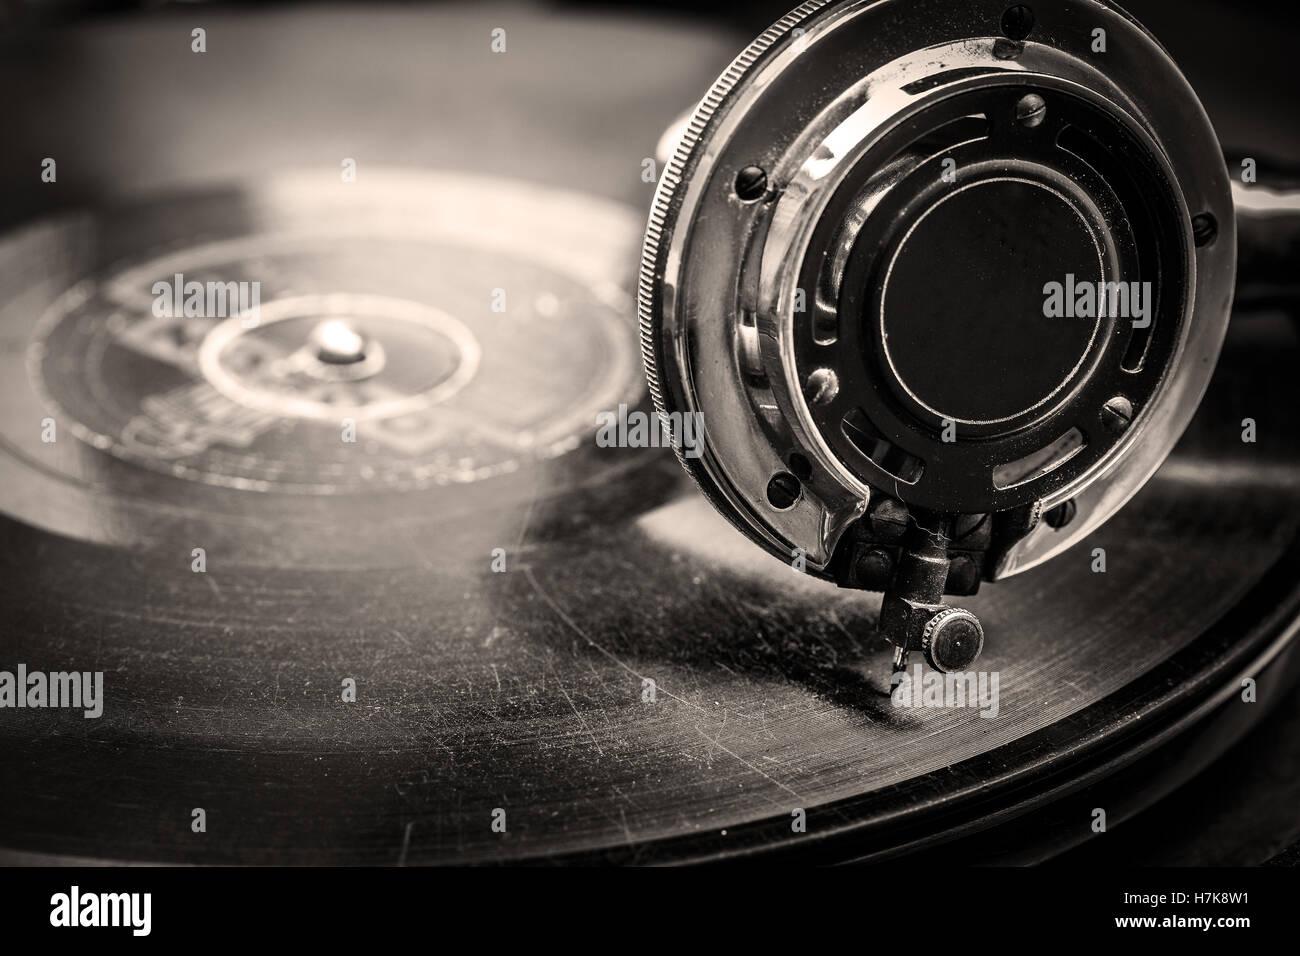 Old, Gramophone playing, close up macro shot in Sepia Tones - Stock Image